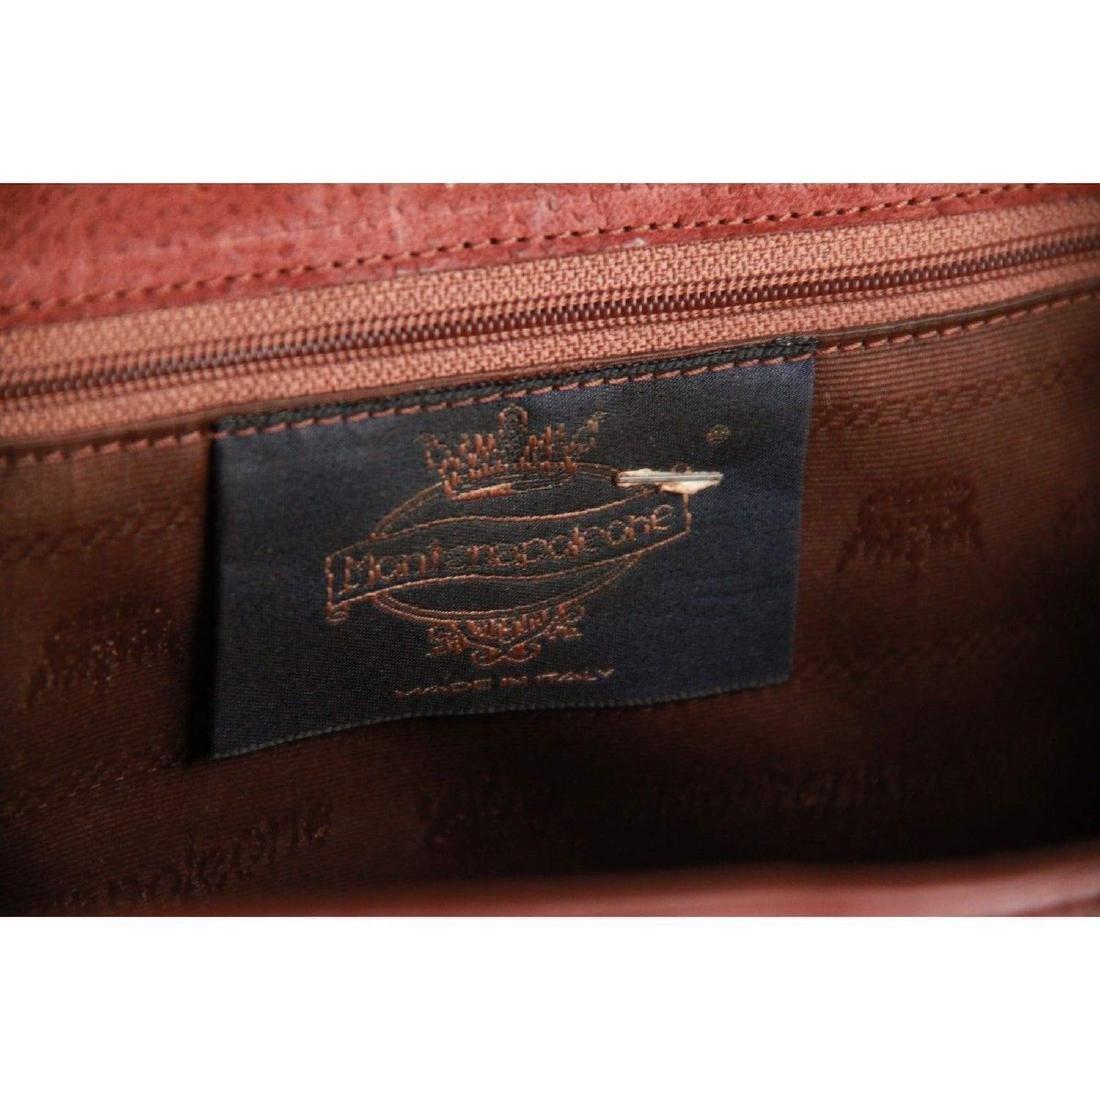 MONTENAPOLEONE Vintage Brown Leather HANDBAG - 9